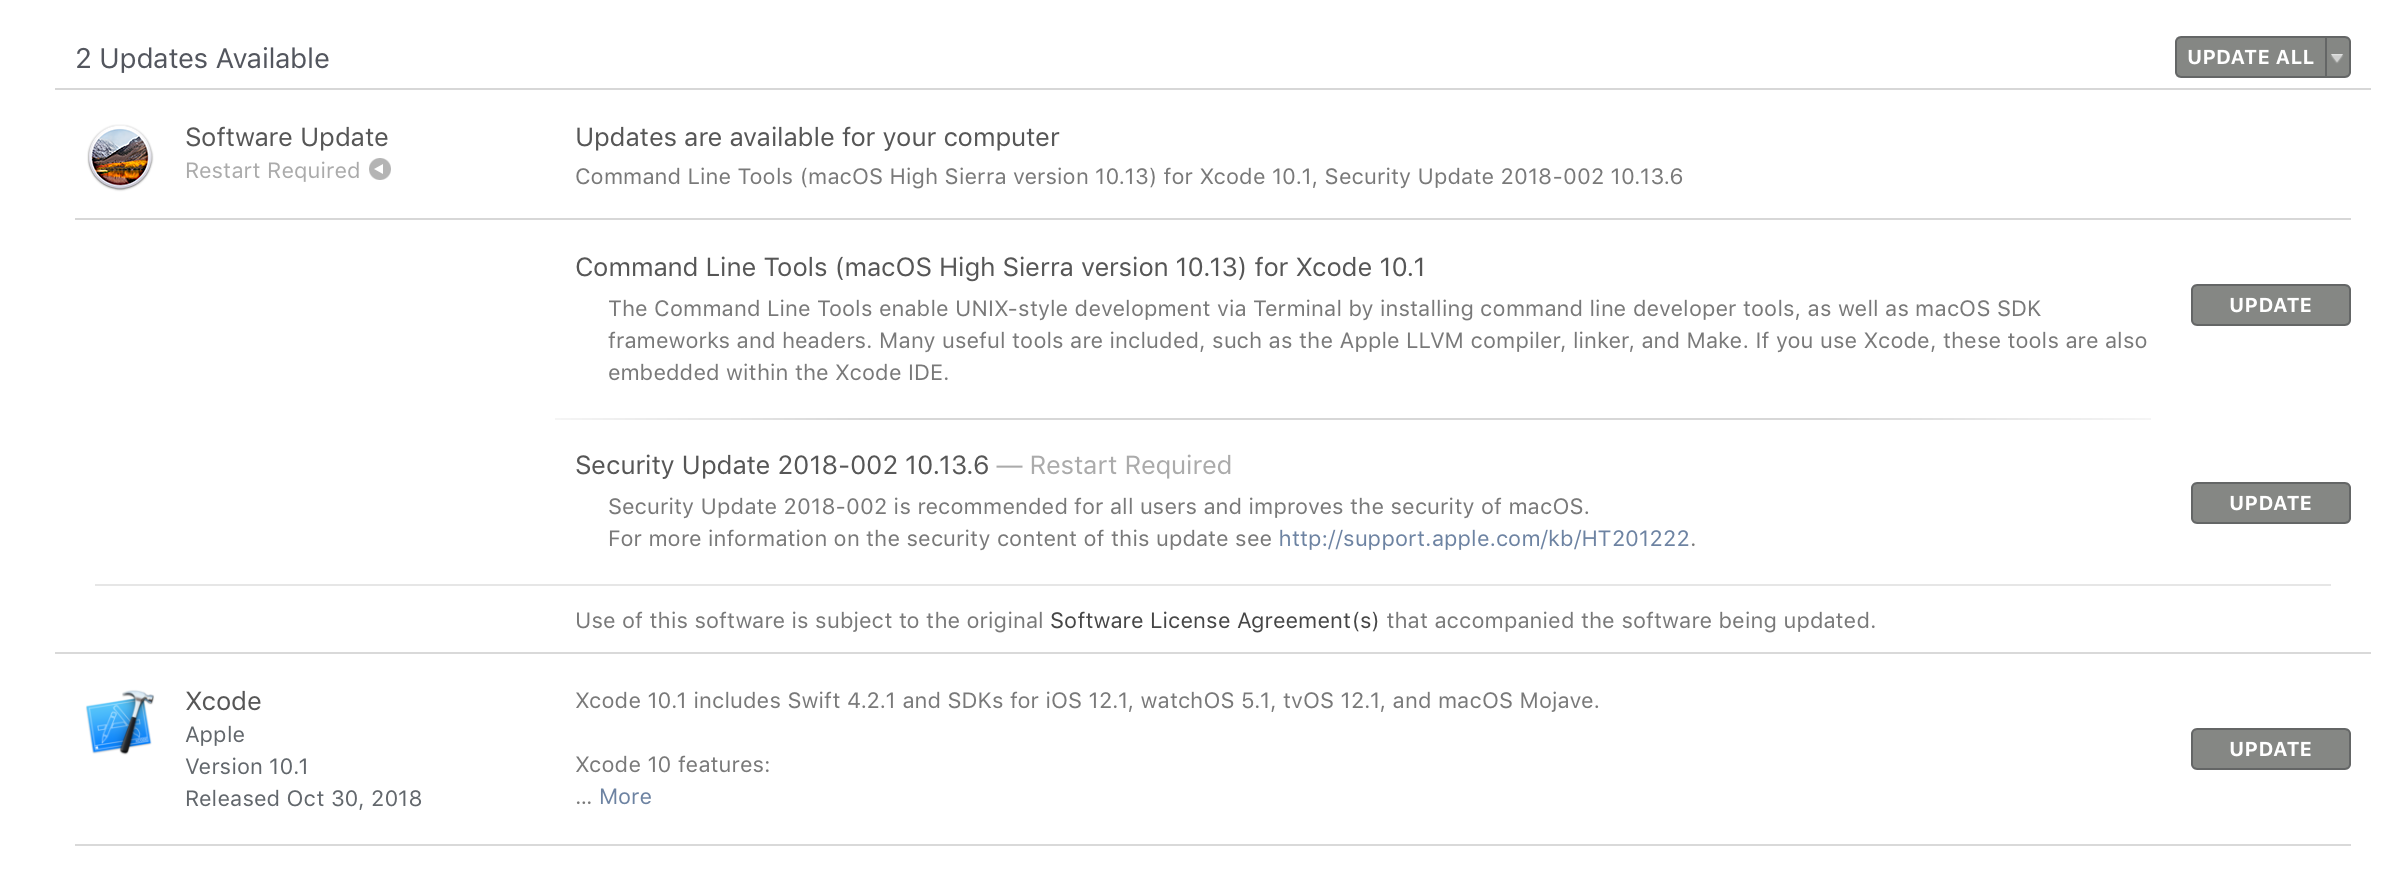 node-gyp rebuild failed on MacOS · Issue #1464 · nodejs/node-gyp